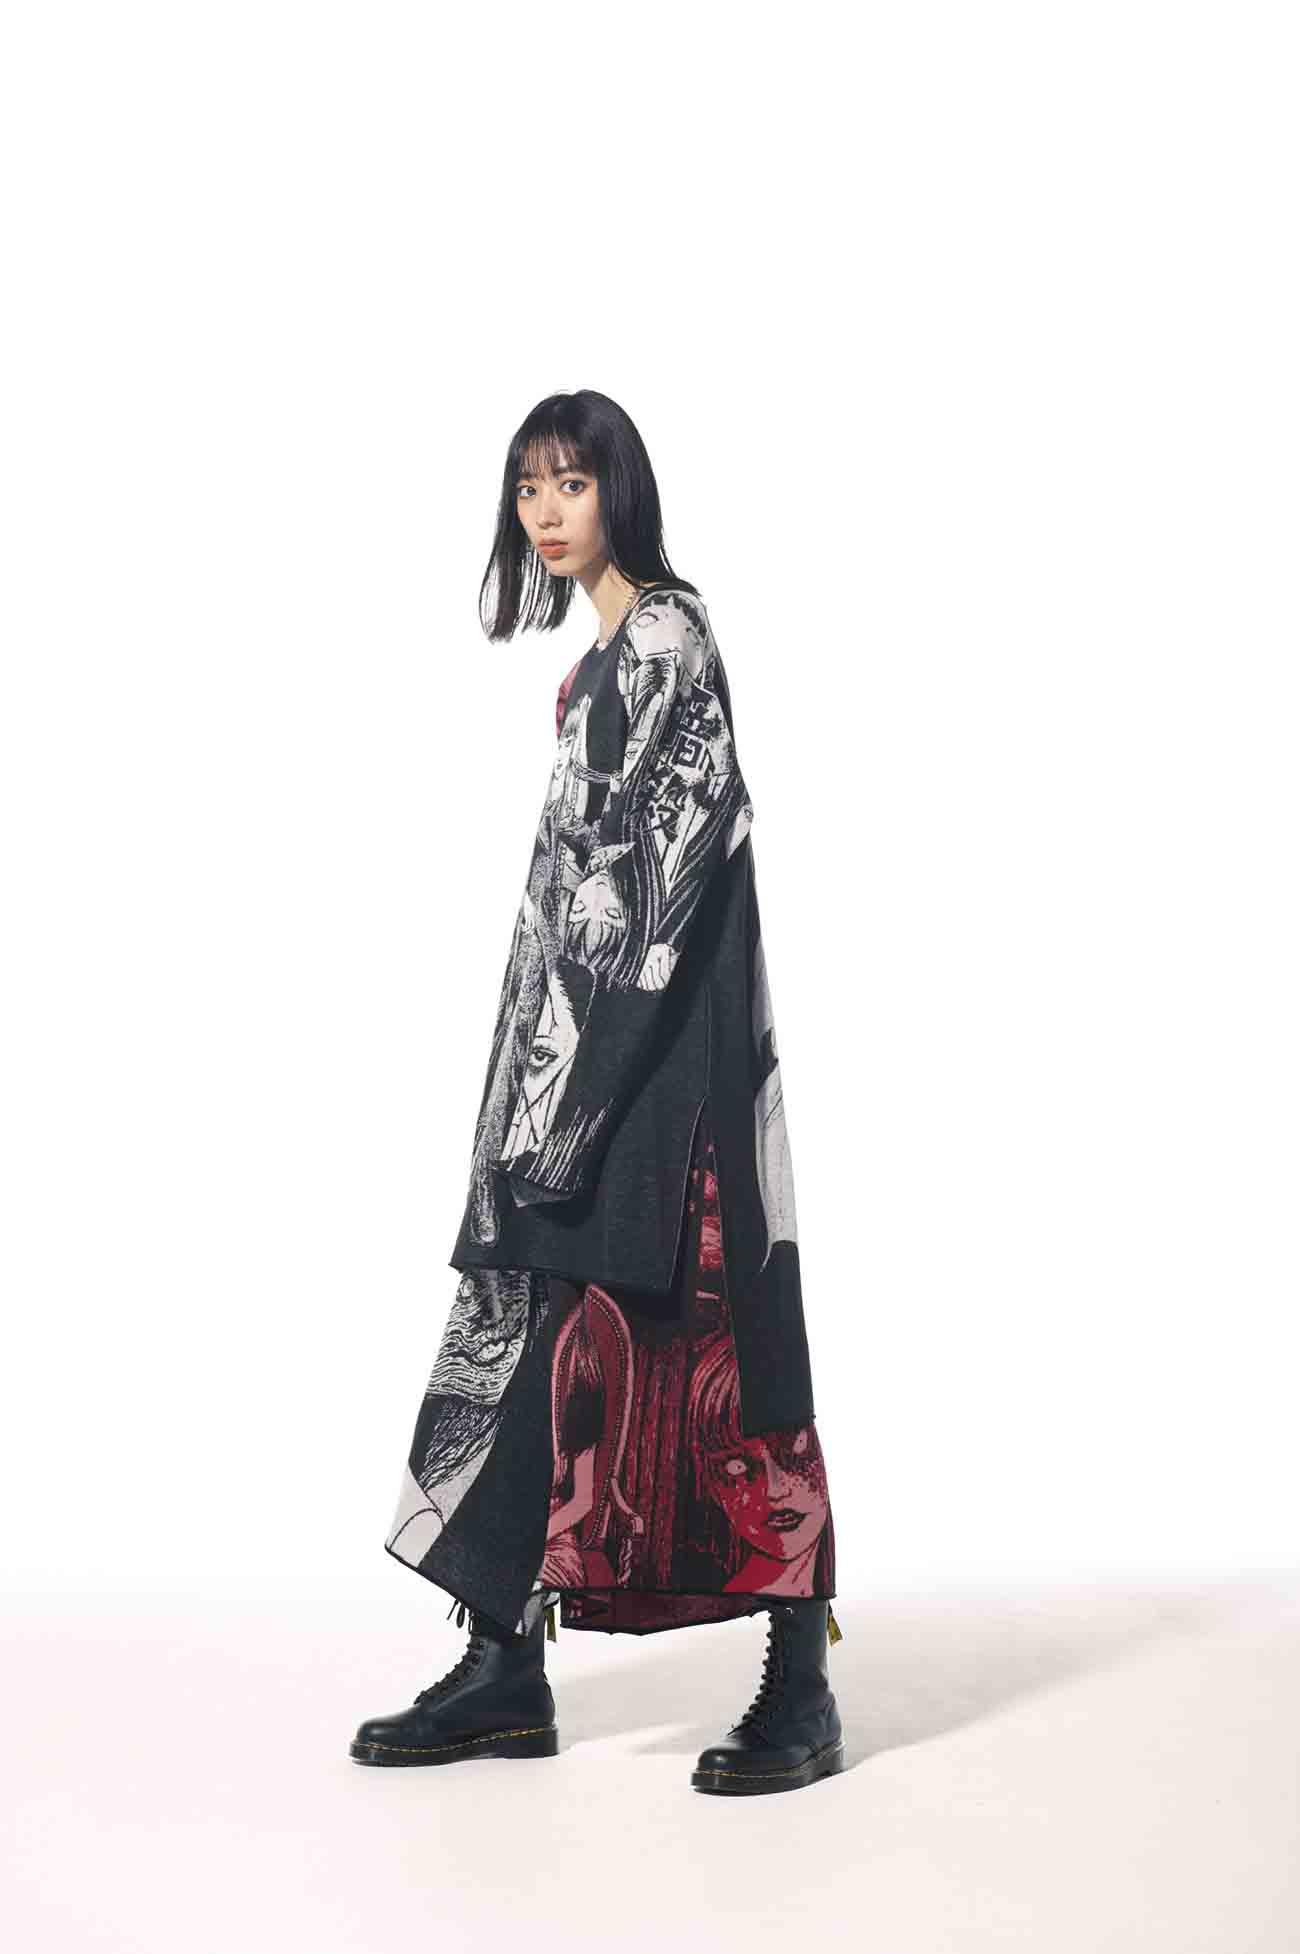 「Tomie」Junji Ito Hameauze Jacquard Crew Raglan Sleeve Long Knit